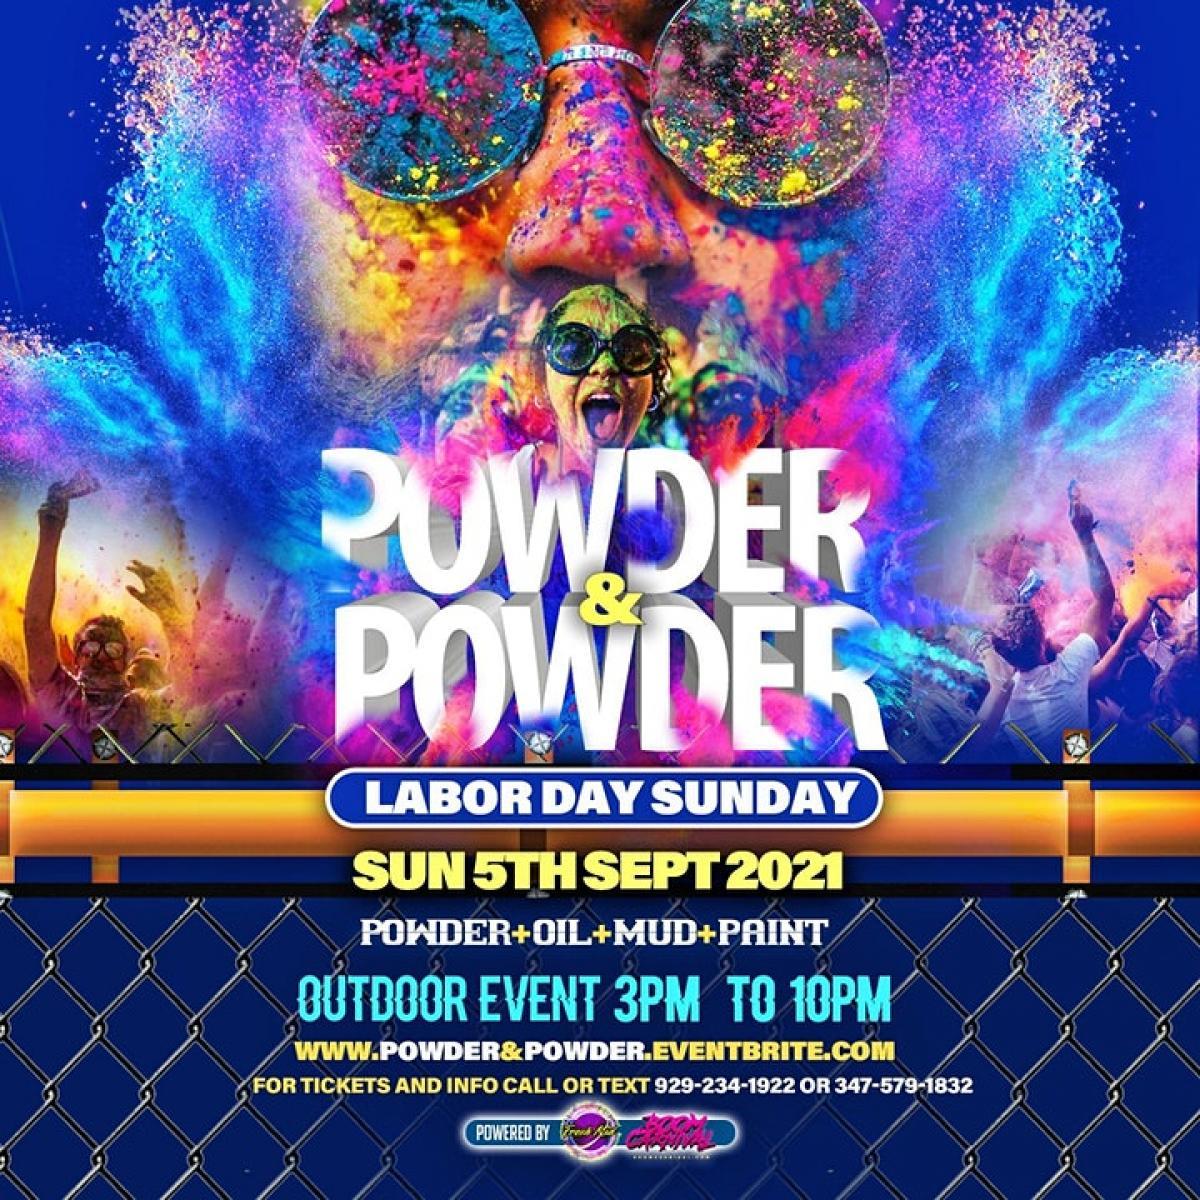 Powder & Powder flyer or graphic.